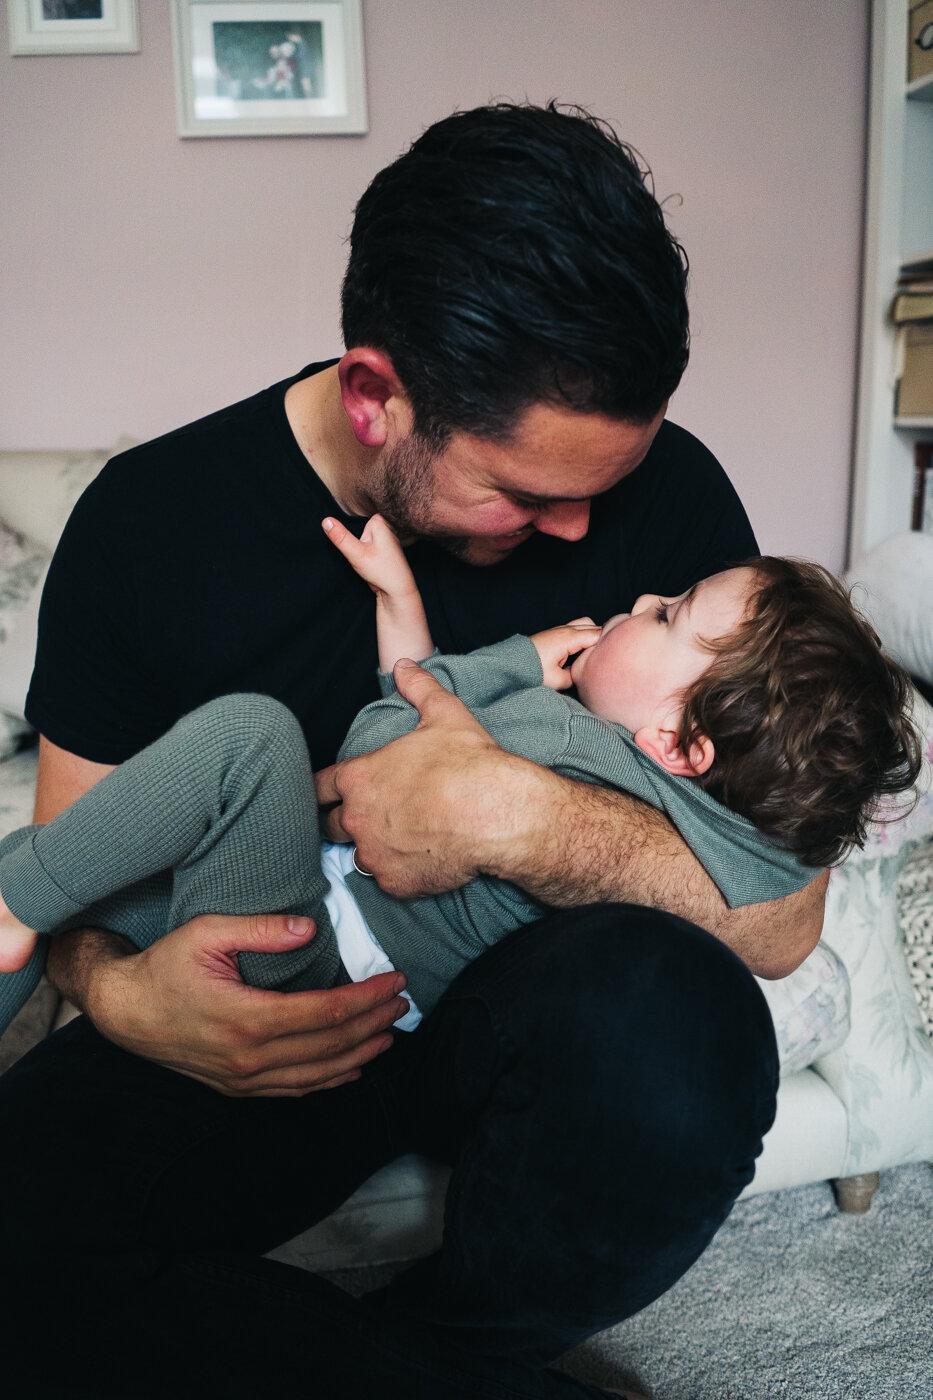 family-photography-teesside-north-yorkshire-newborn-baby-family-shoot-0006.jpg